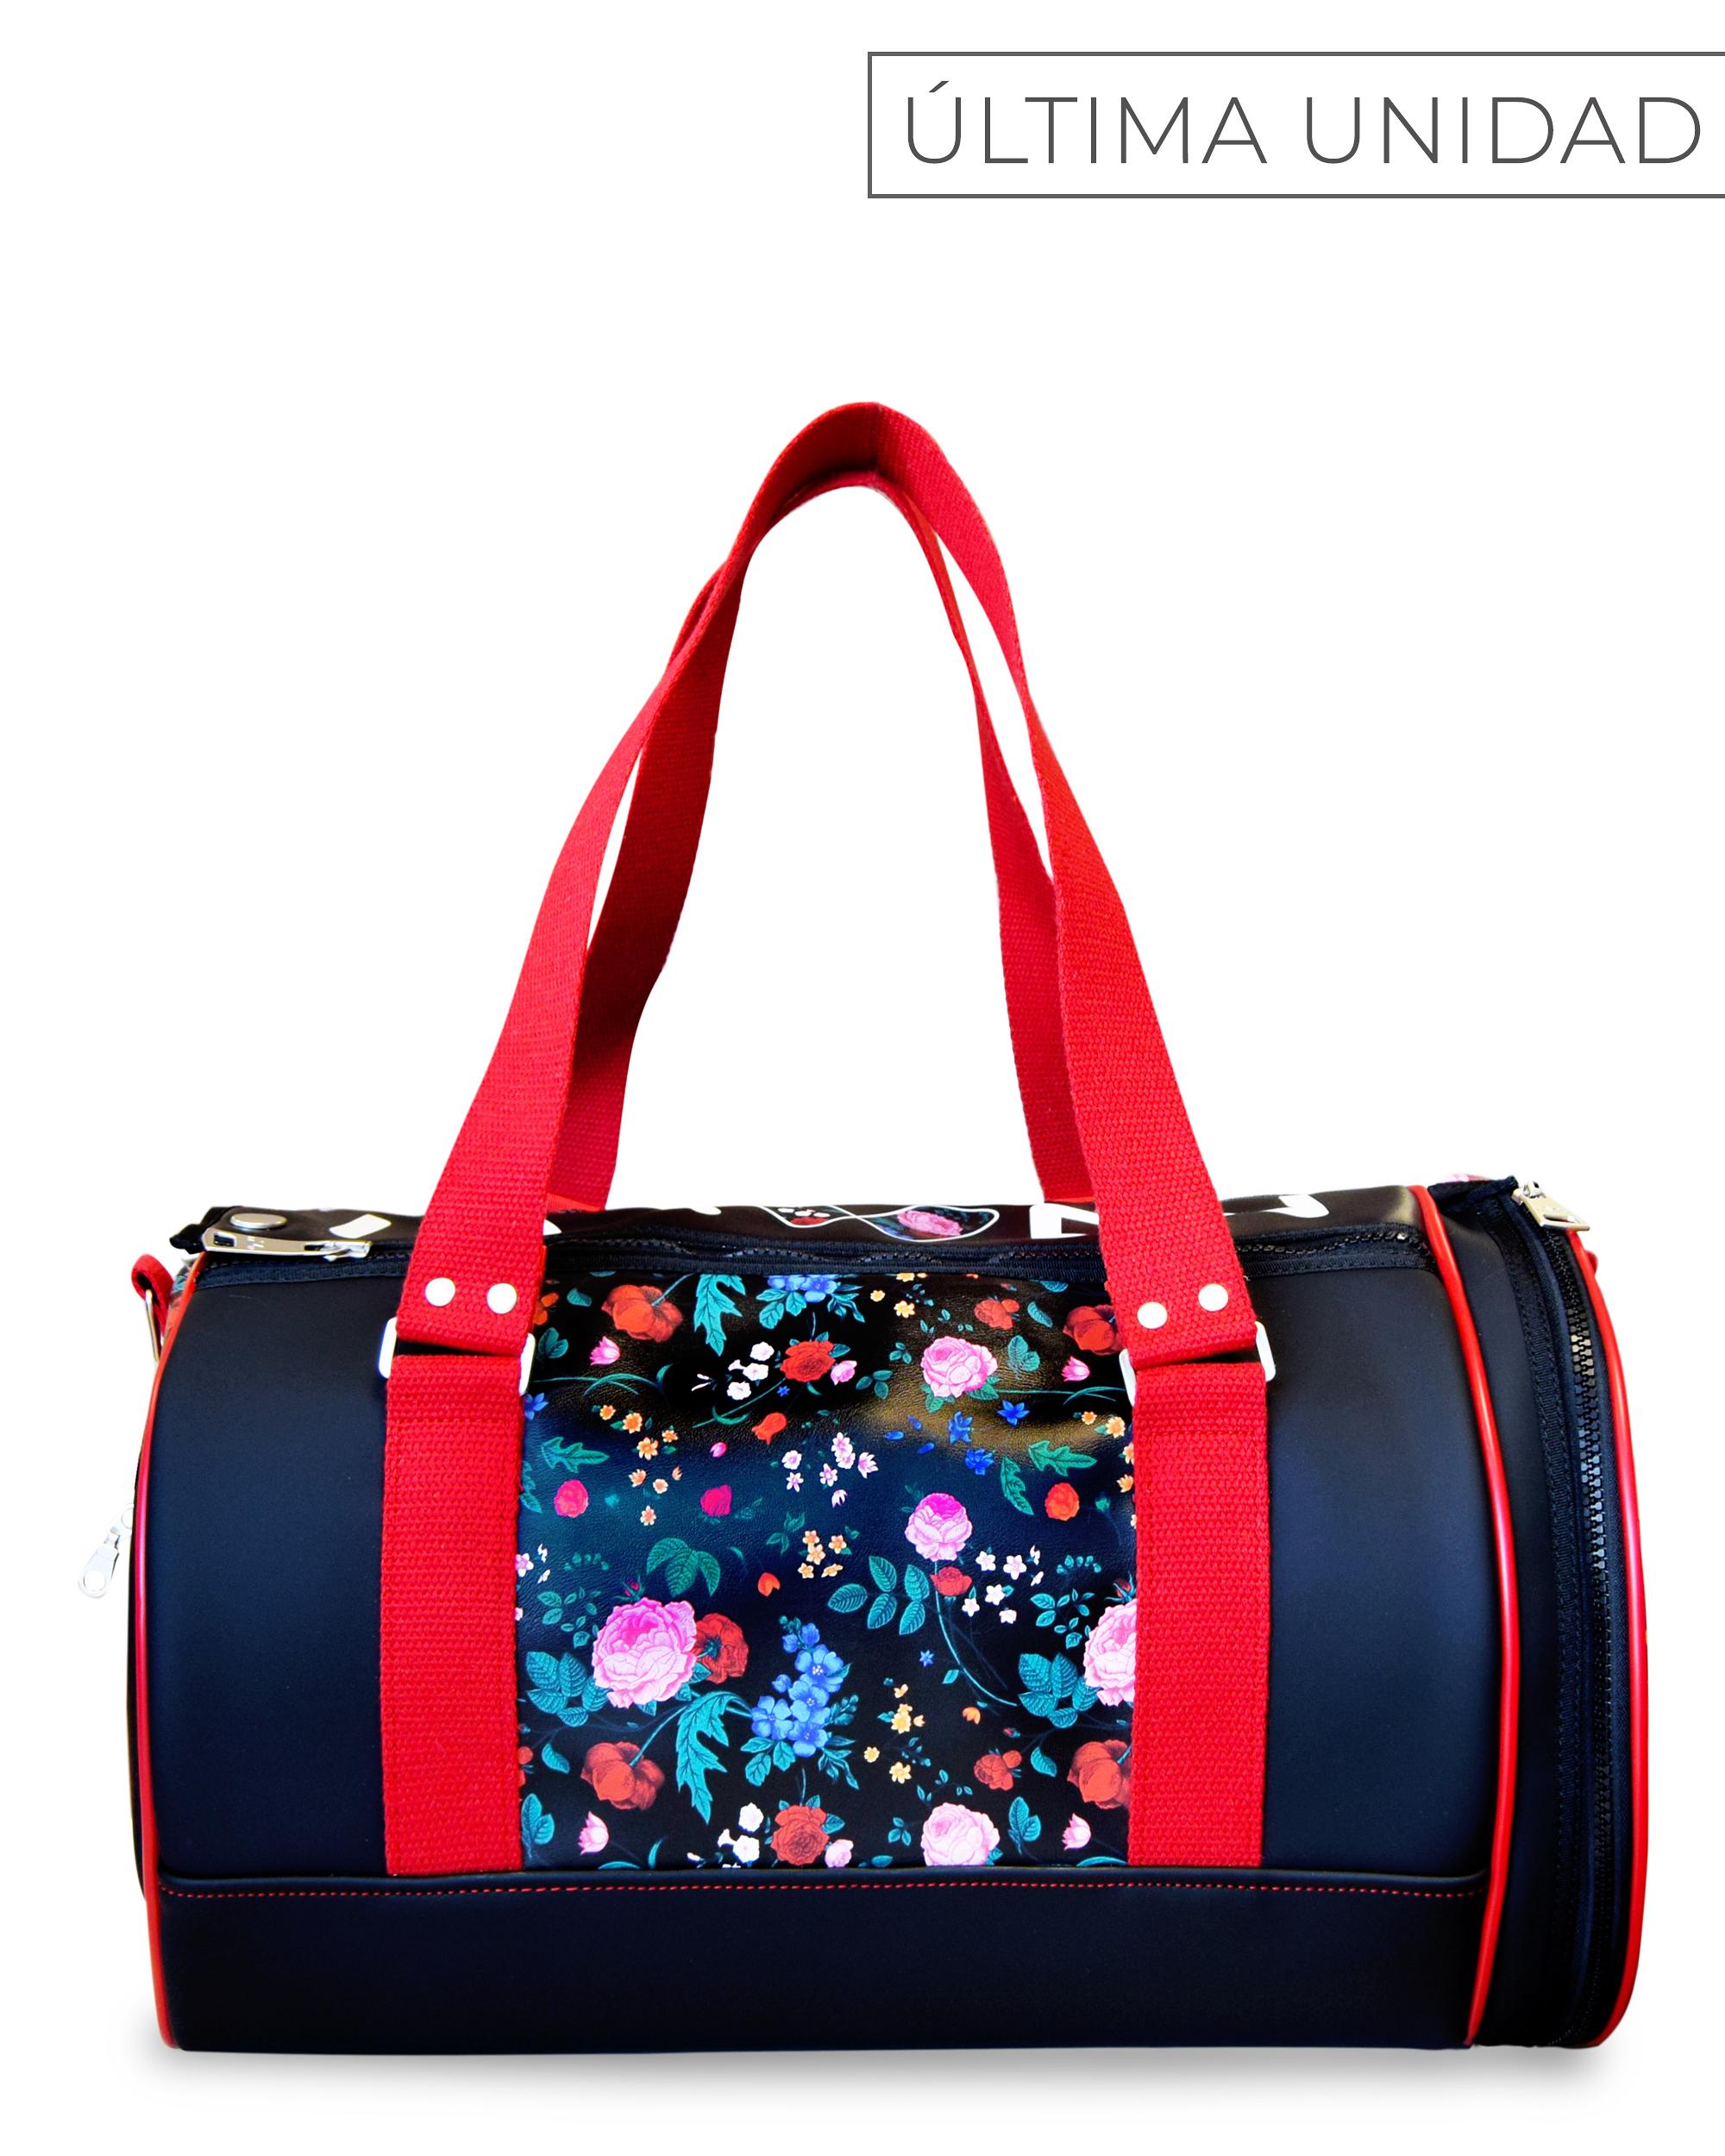 SPORT DUFFLE BAG FLORAL PRINT GYM BAGS CE IDAWEN - Woman and